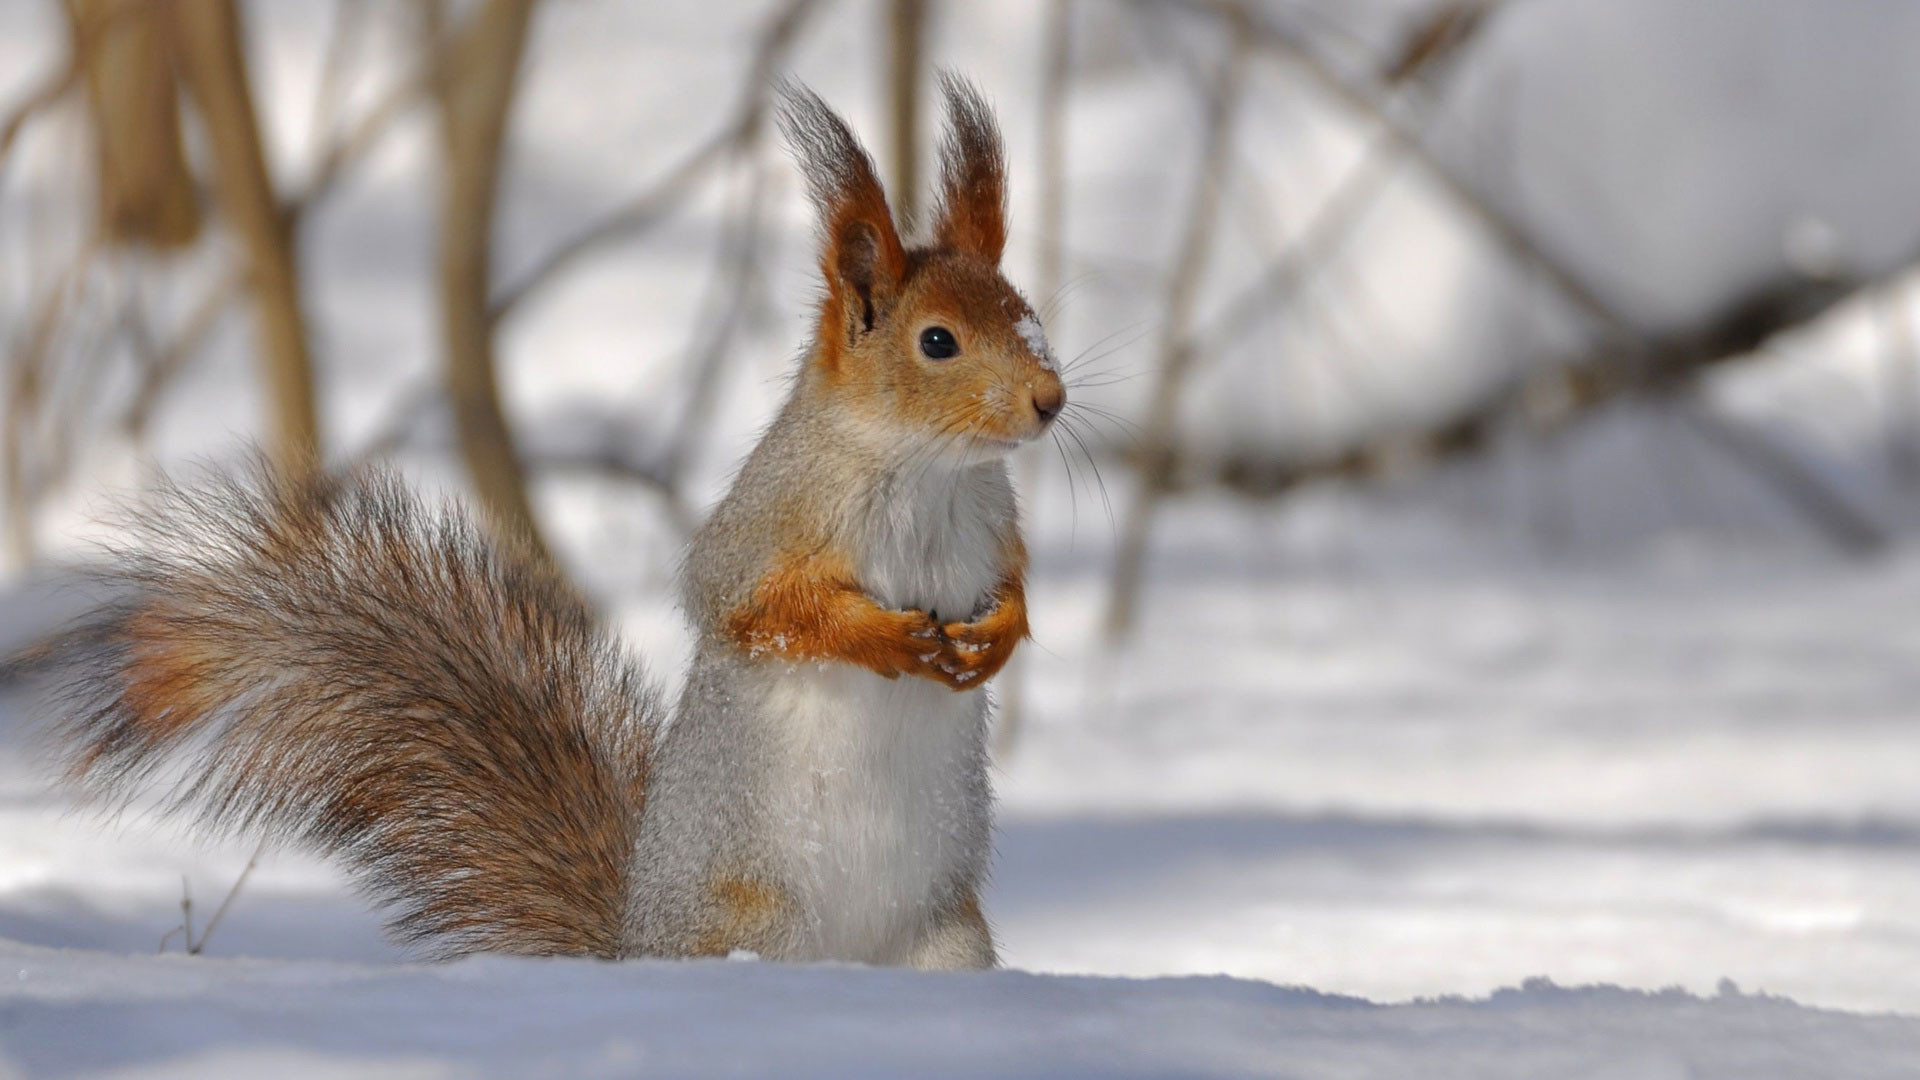 Cute Winter Animal Wallpaper (48+ Images